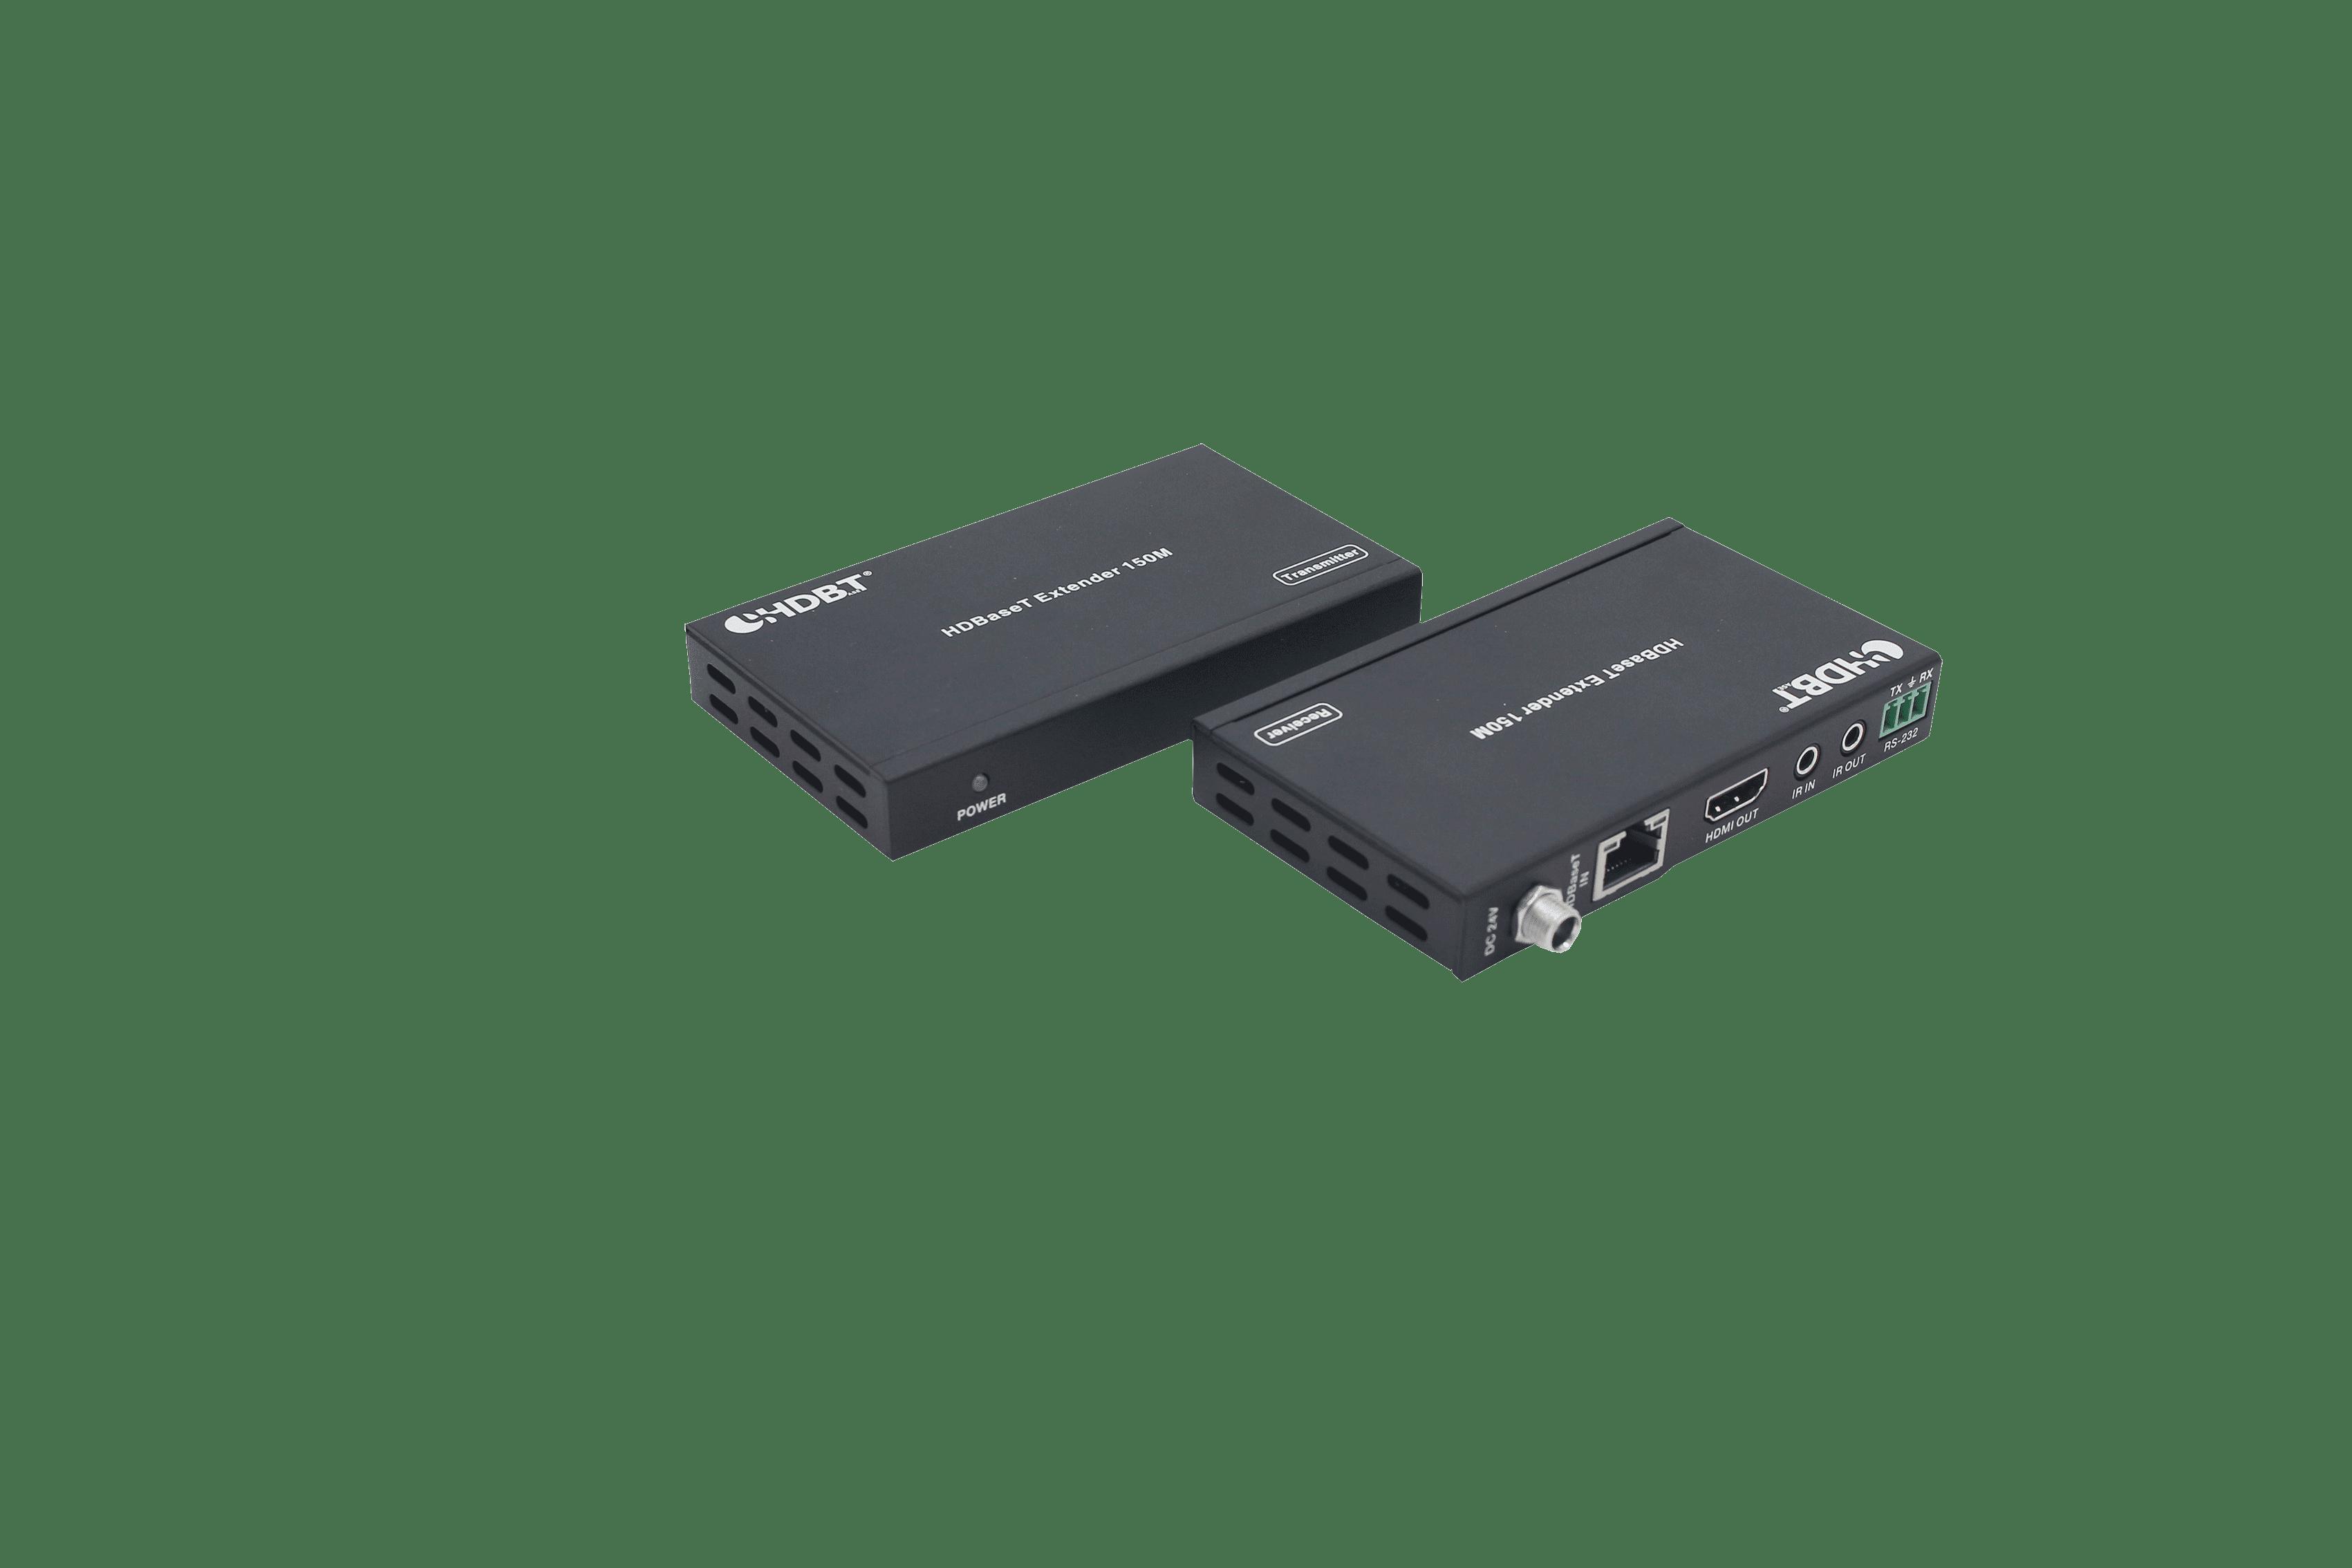 Php30 401 02 Romoss Sense8 30000mah Qc Type C Power Bank Orico 3569s3 35 Inch Hdd Sata30 Tool Free Hard Drive Enclosure Hbt E150c 1